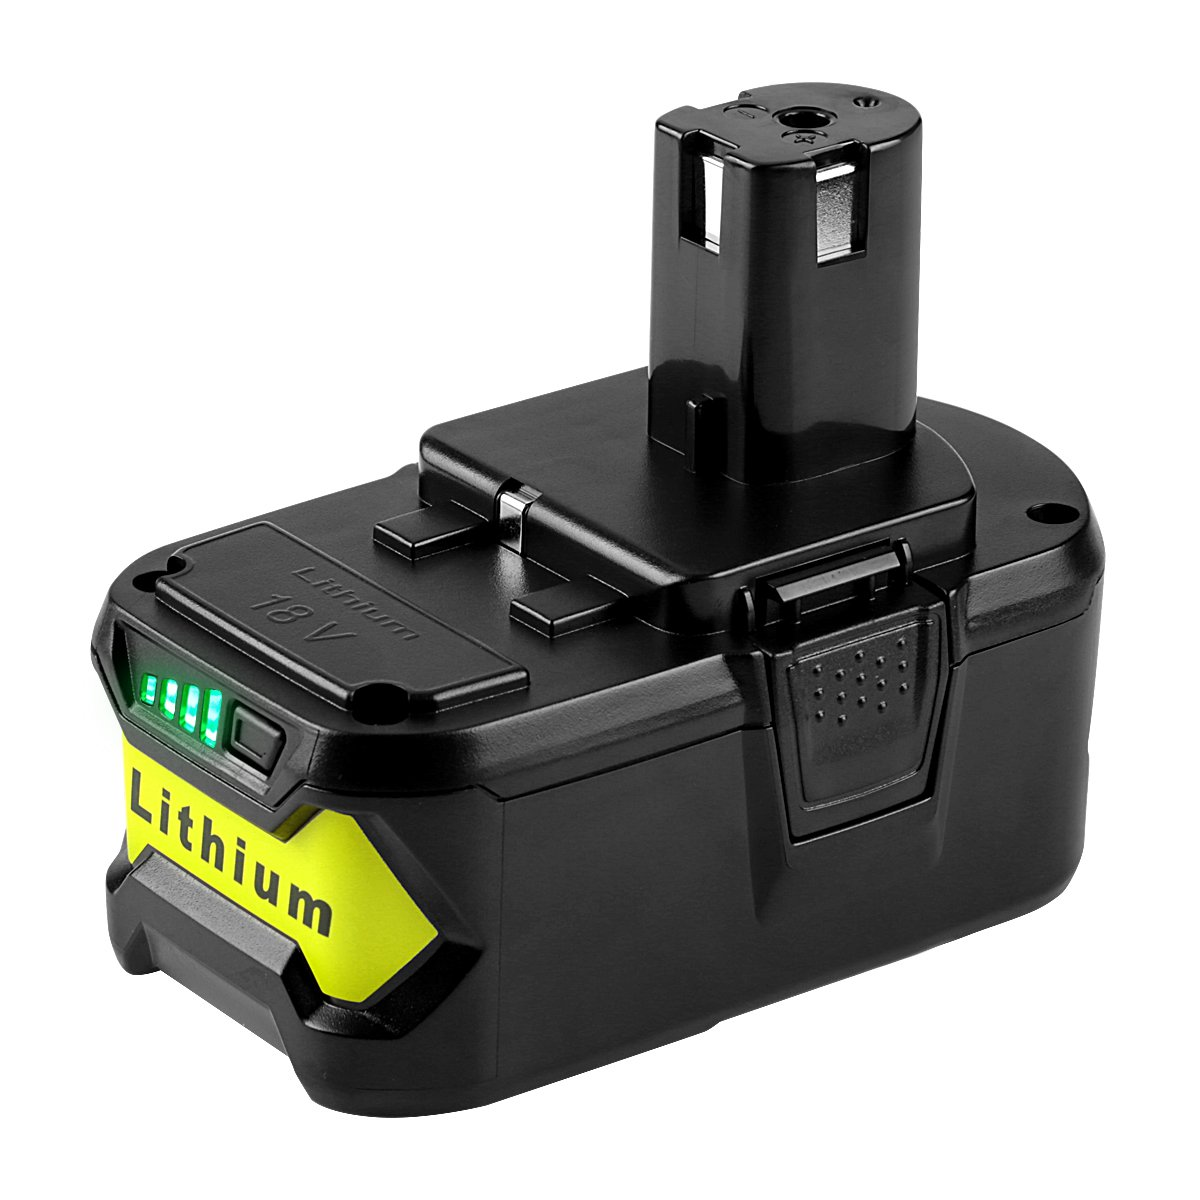 Powilling 5000mAh Ryobi 18V Lithium Battery Replacement for Ryobi 18-Volt 18L50 ONE+ P104 P105 P102 P103 P107 P108 P109 Tool